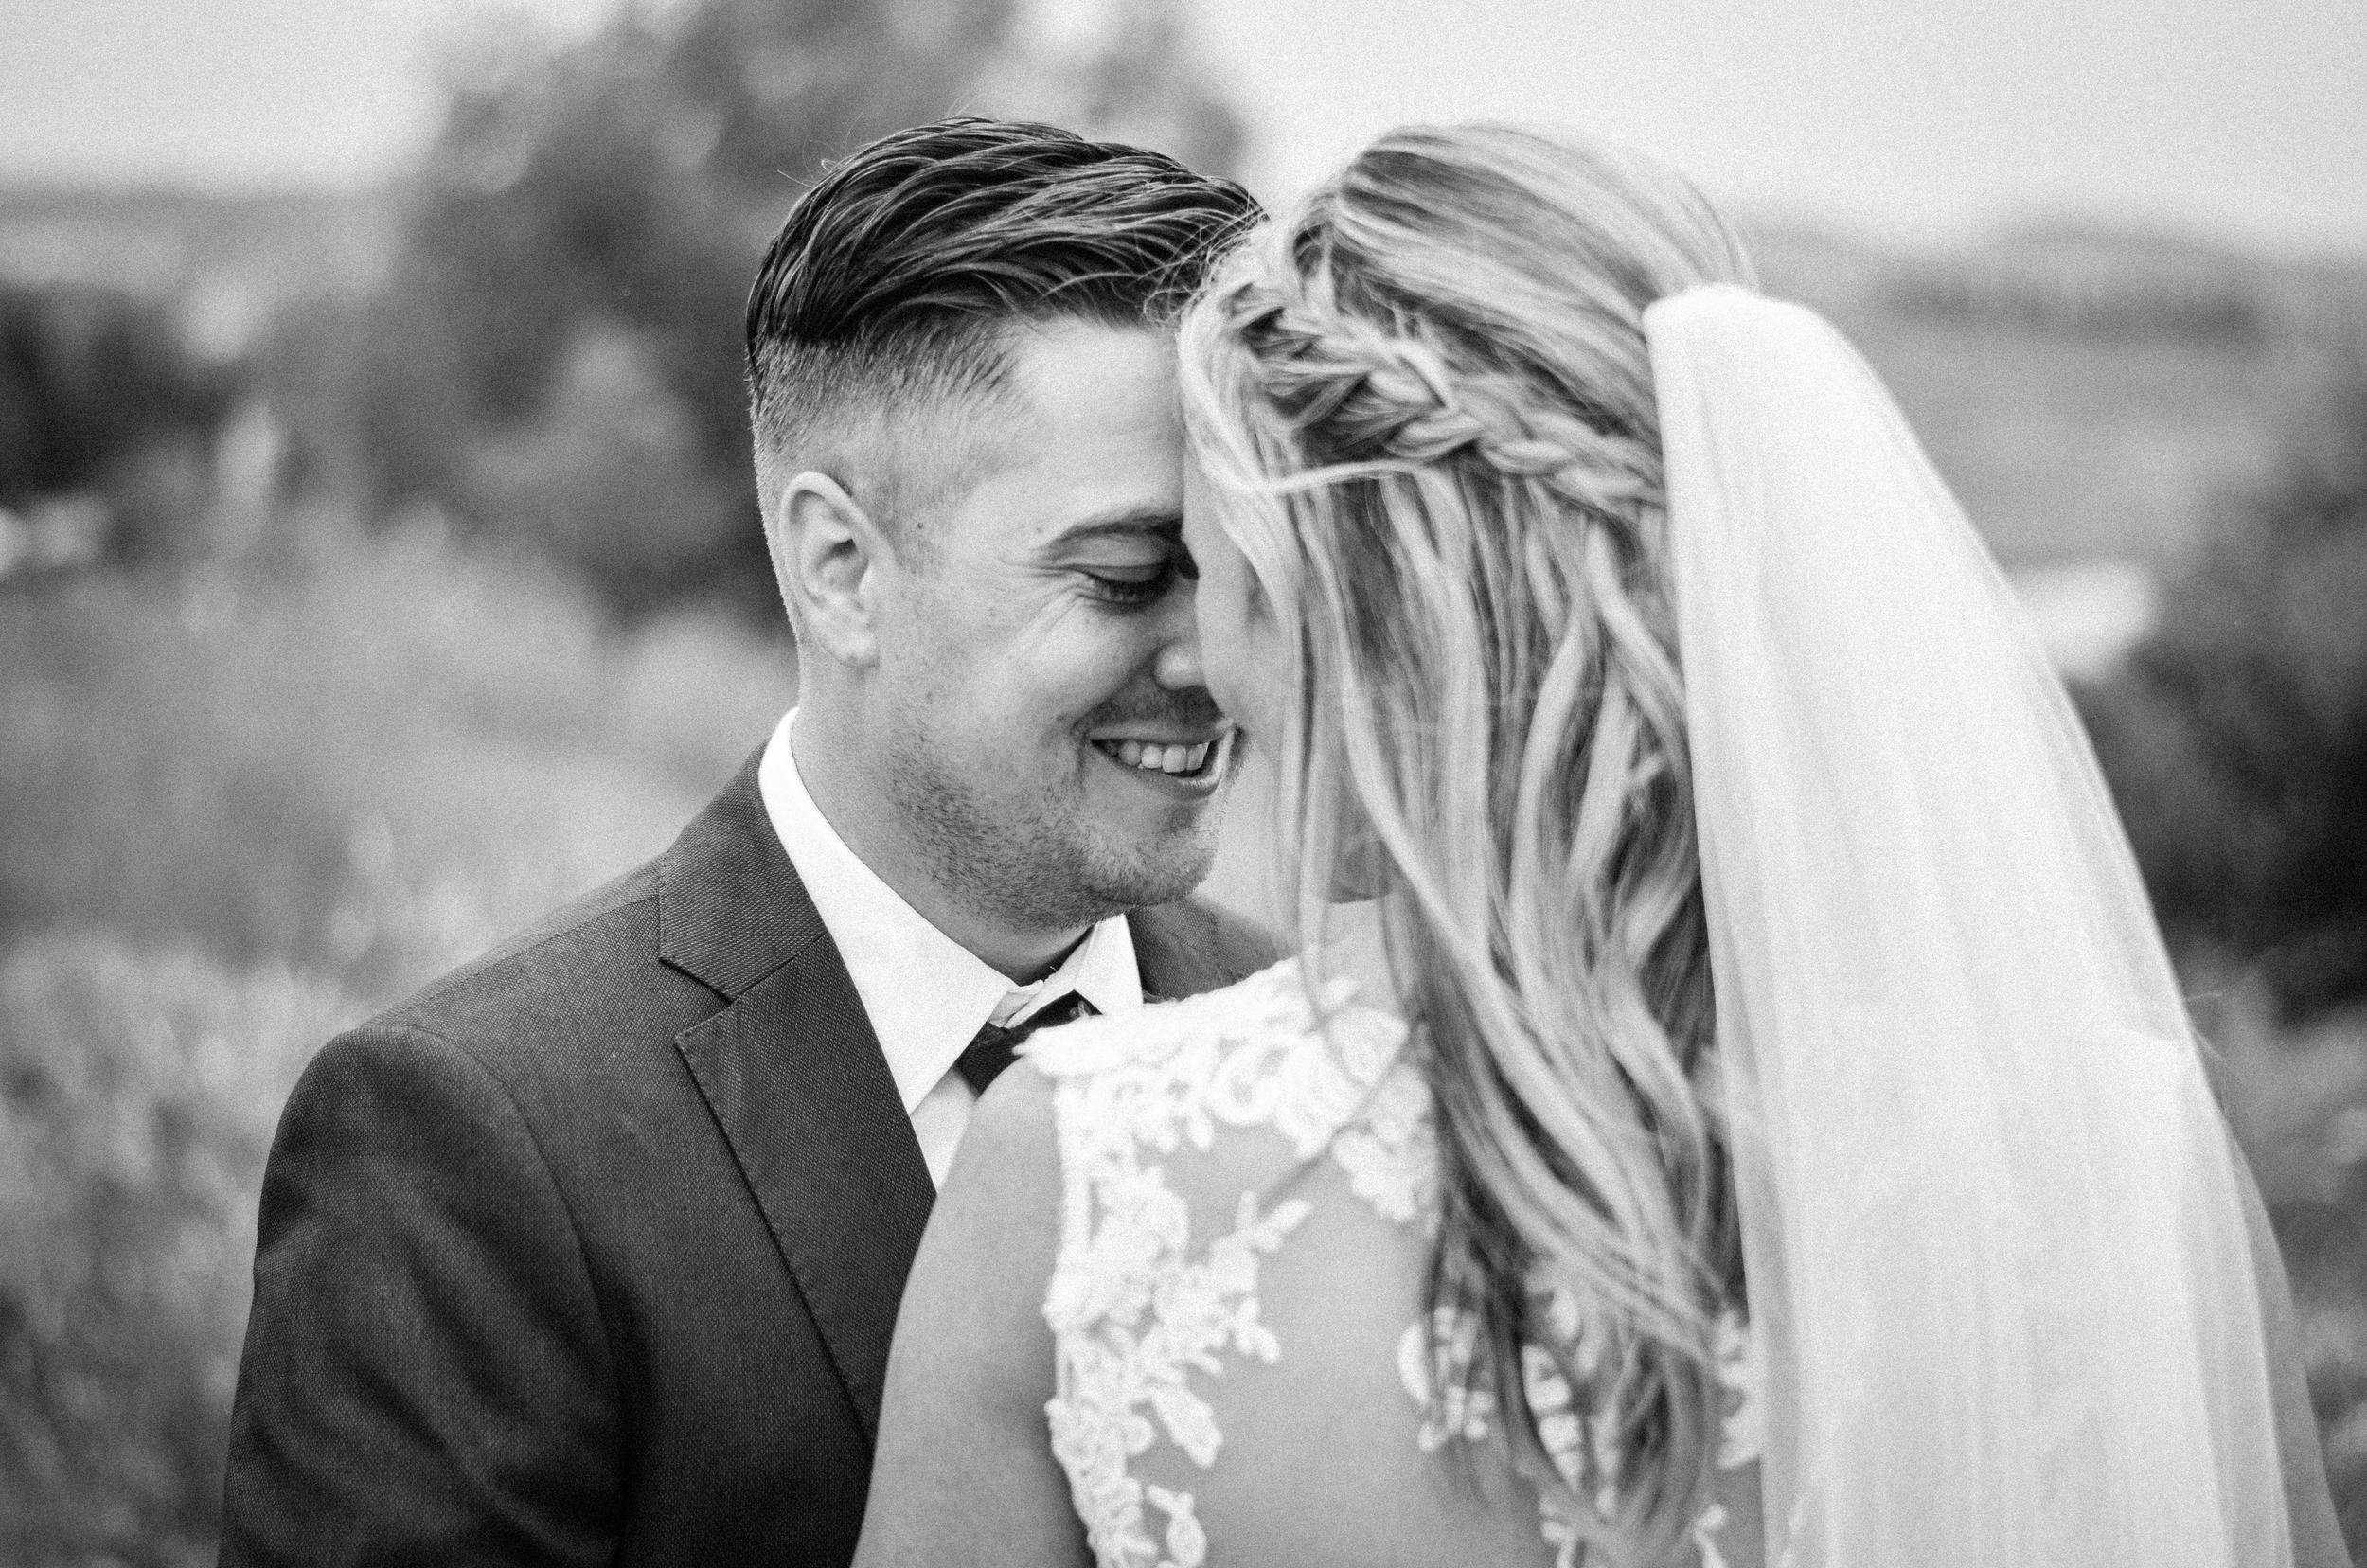 Ryan & Laura - Eagles Nest Wedding, July 17, 2015